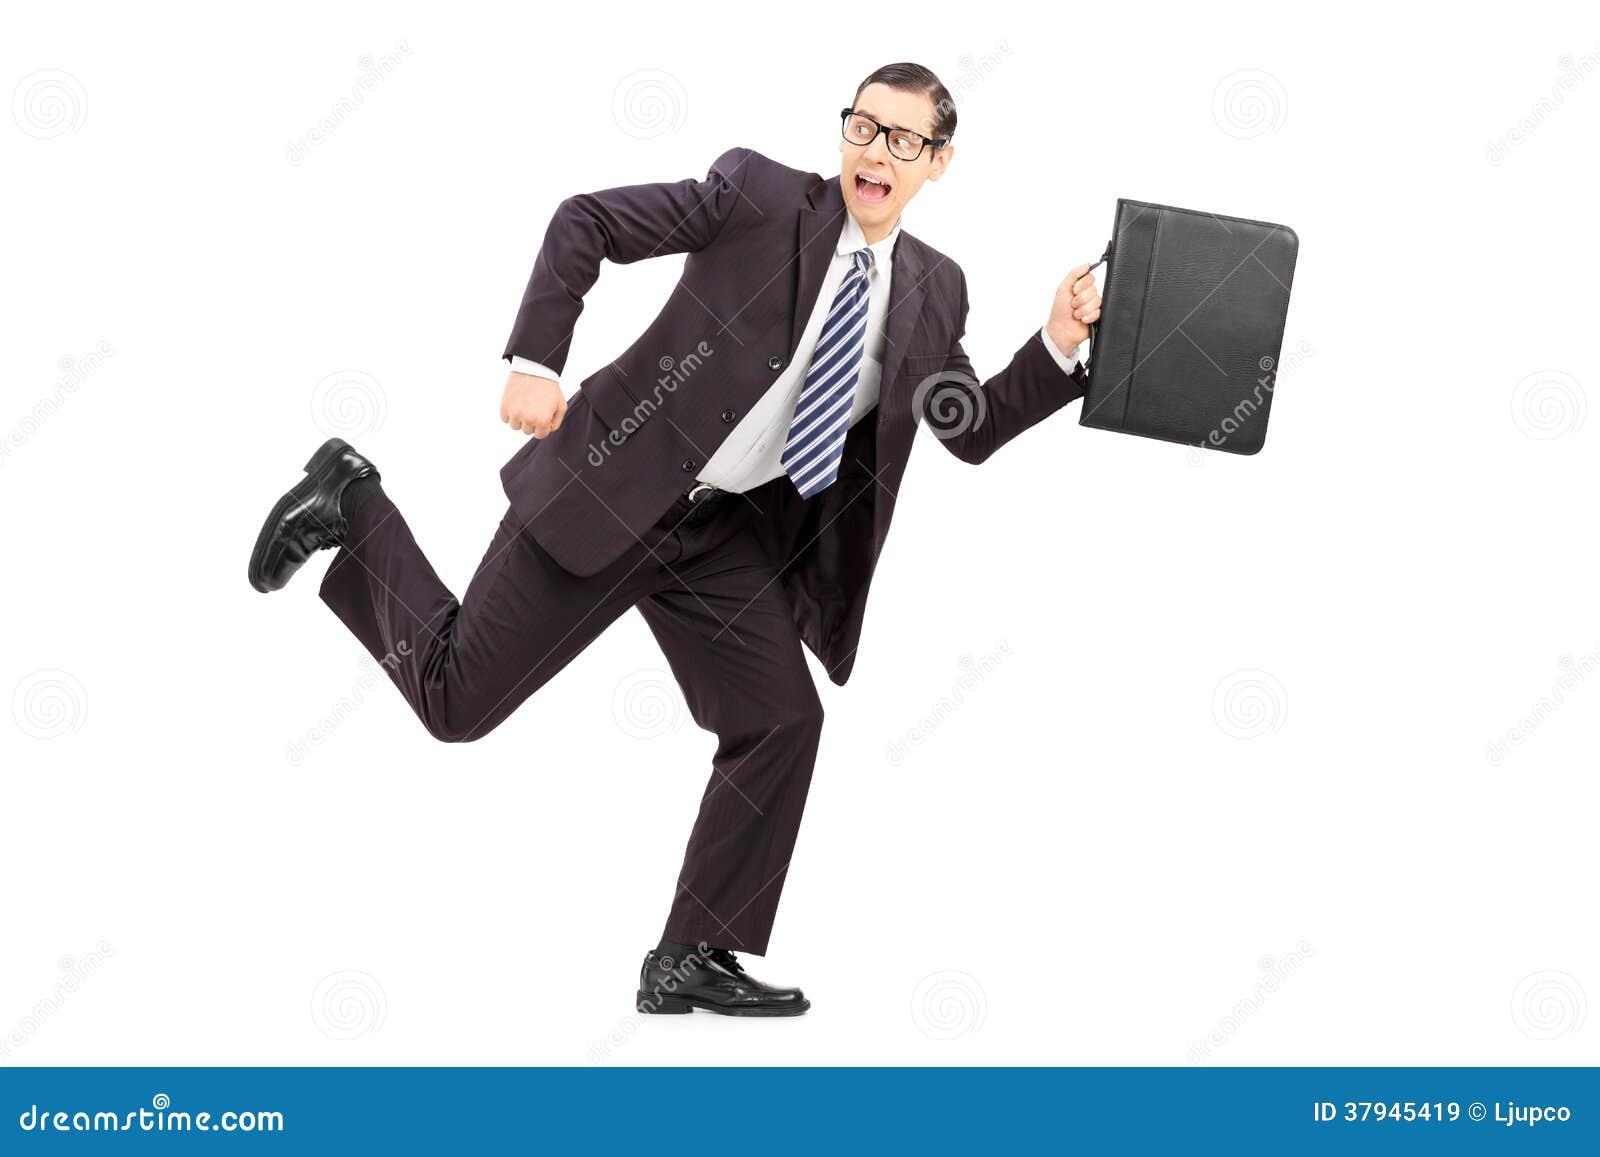 Guy running away scared